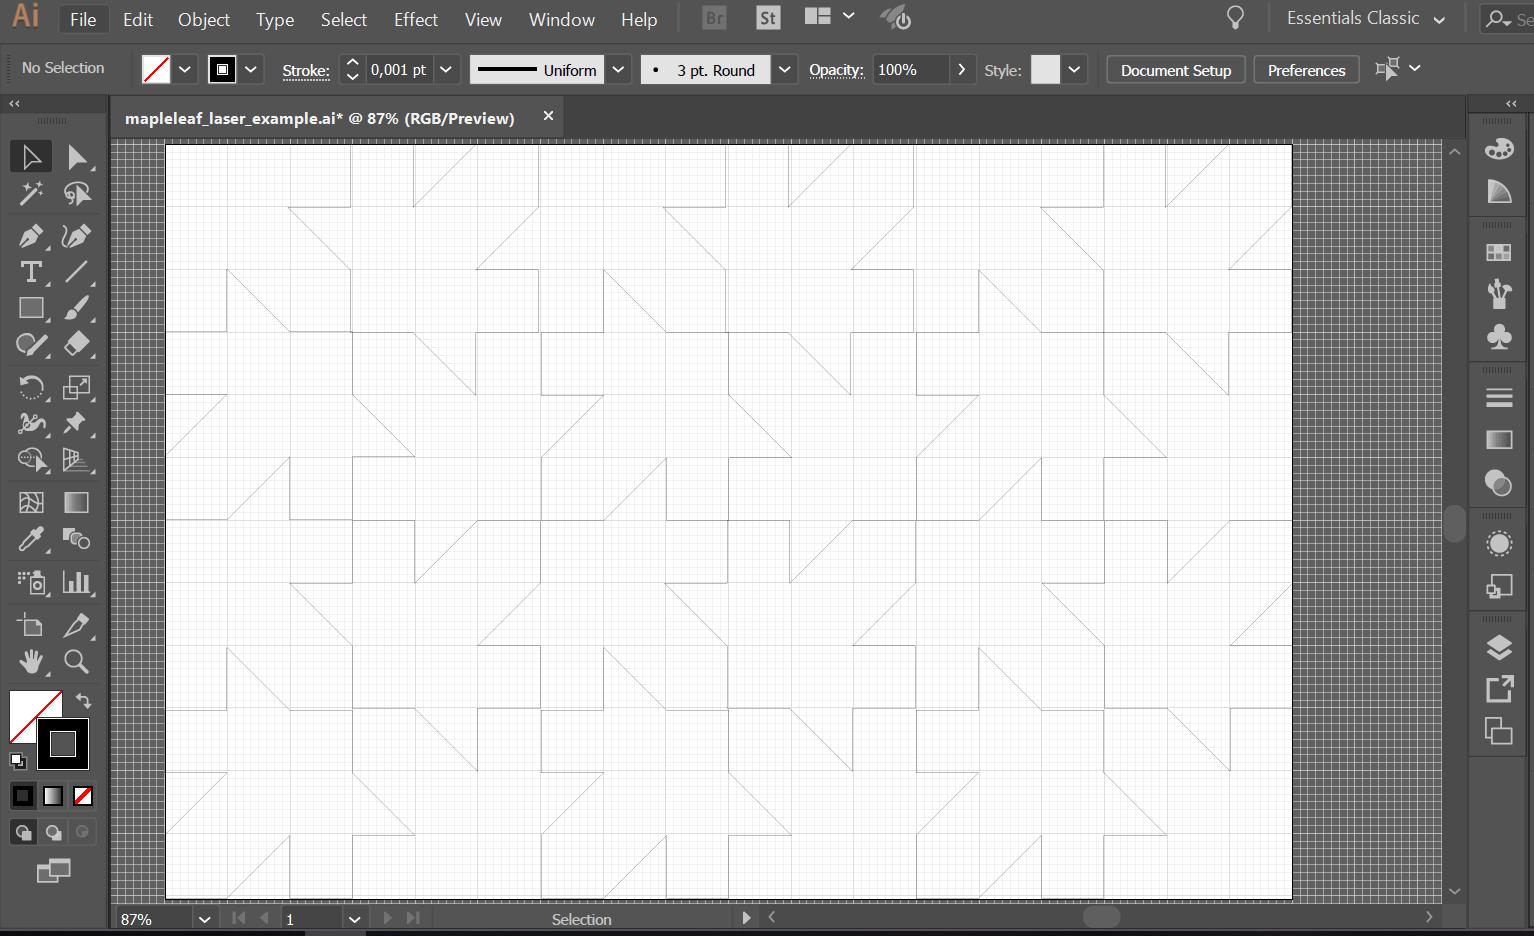 illustrator file prepared for laser cutting